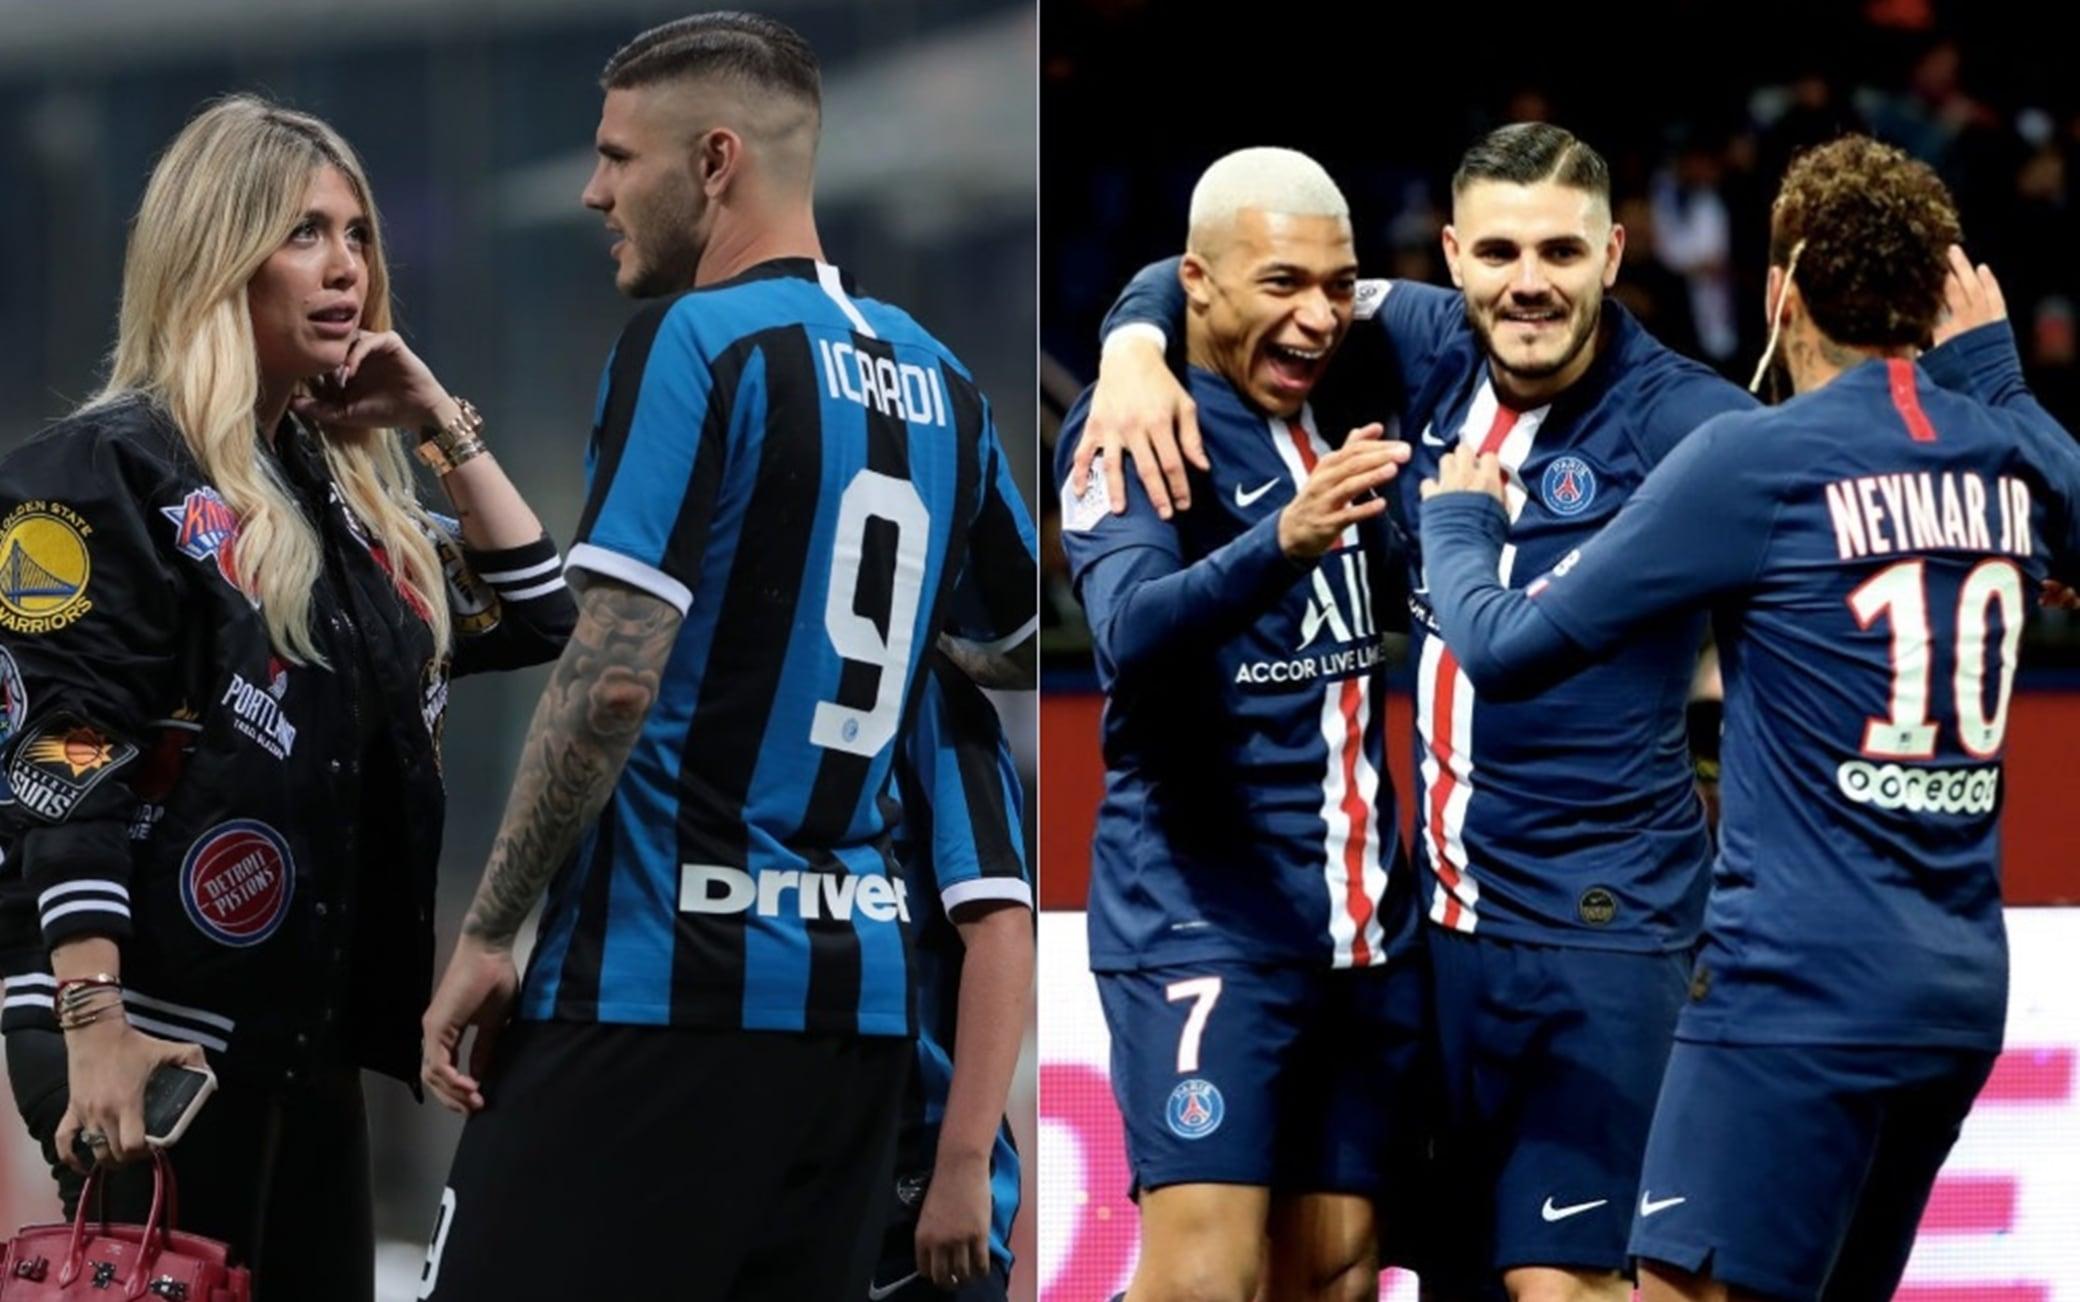 Mauro Icardi E Wanda Nara Il 2019 In 30 Foto Sky Sport